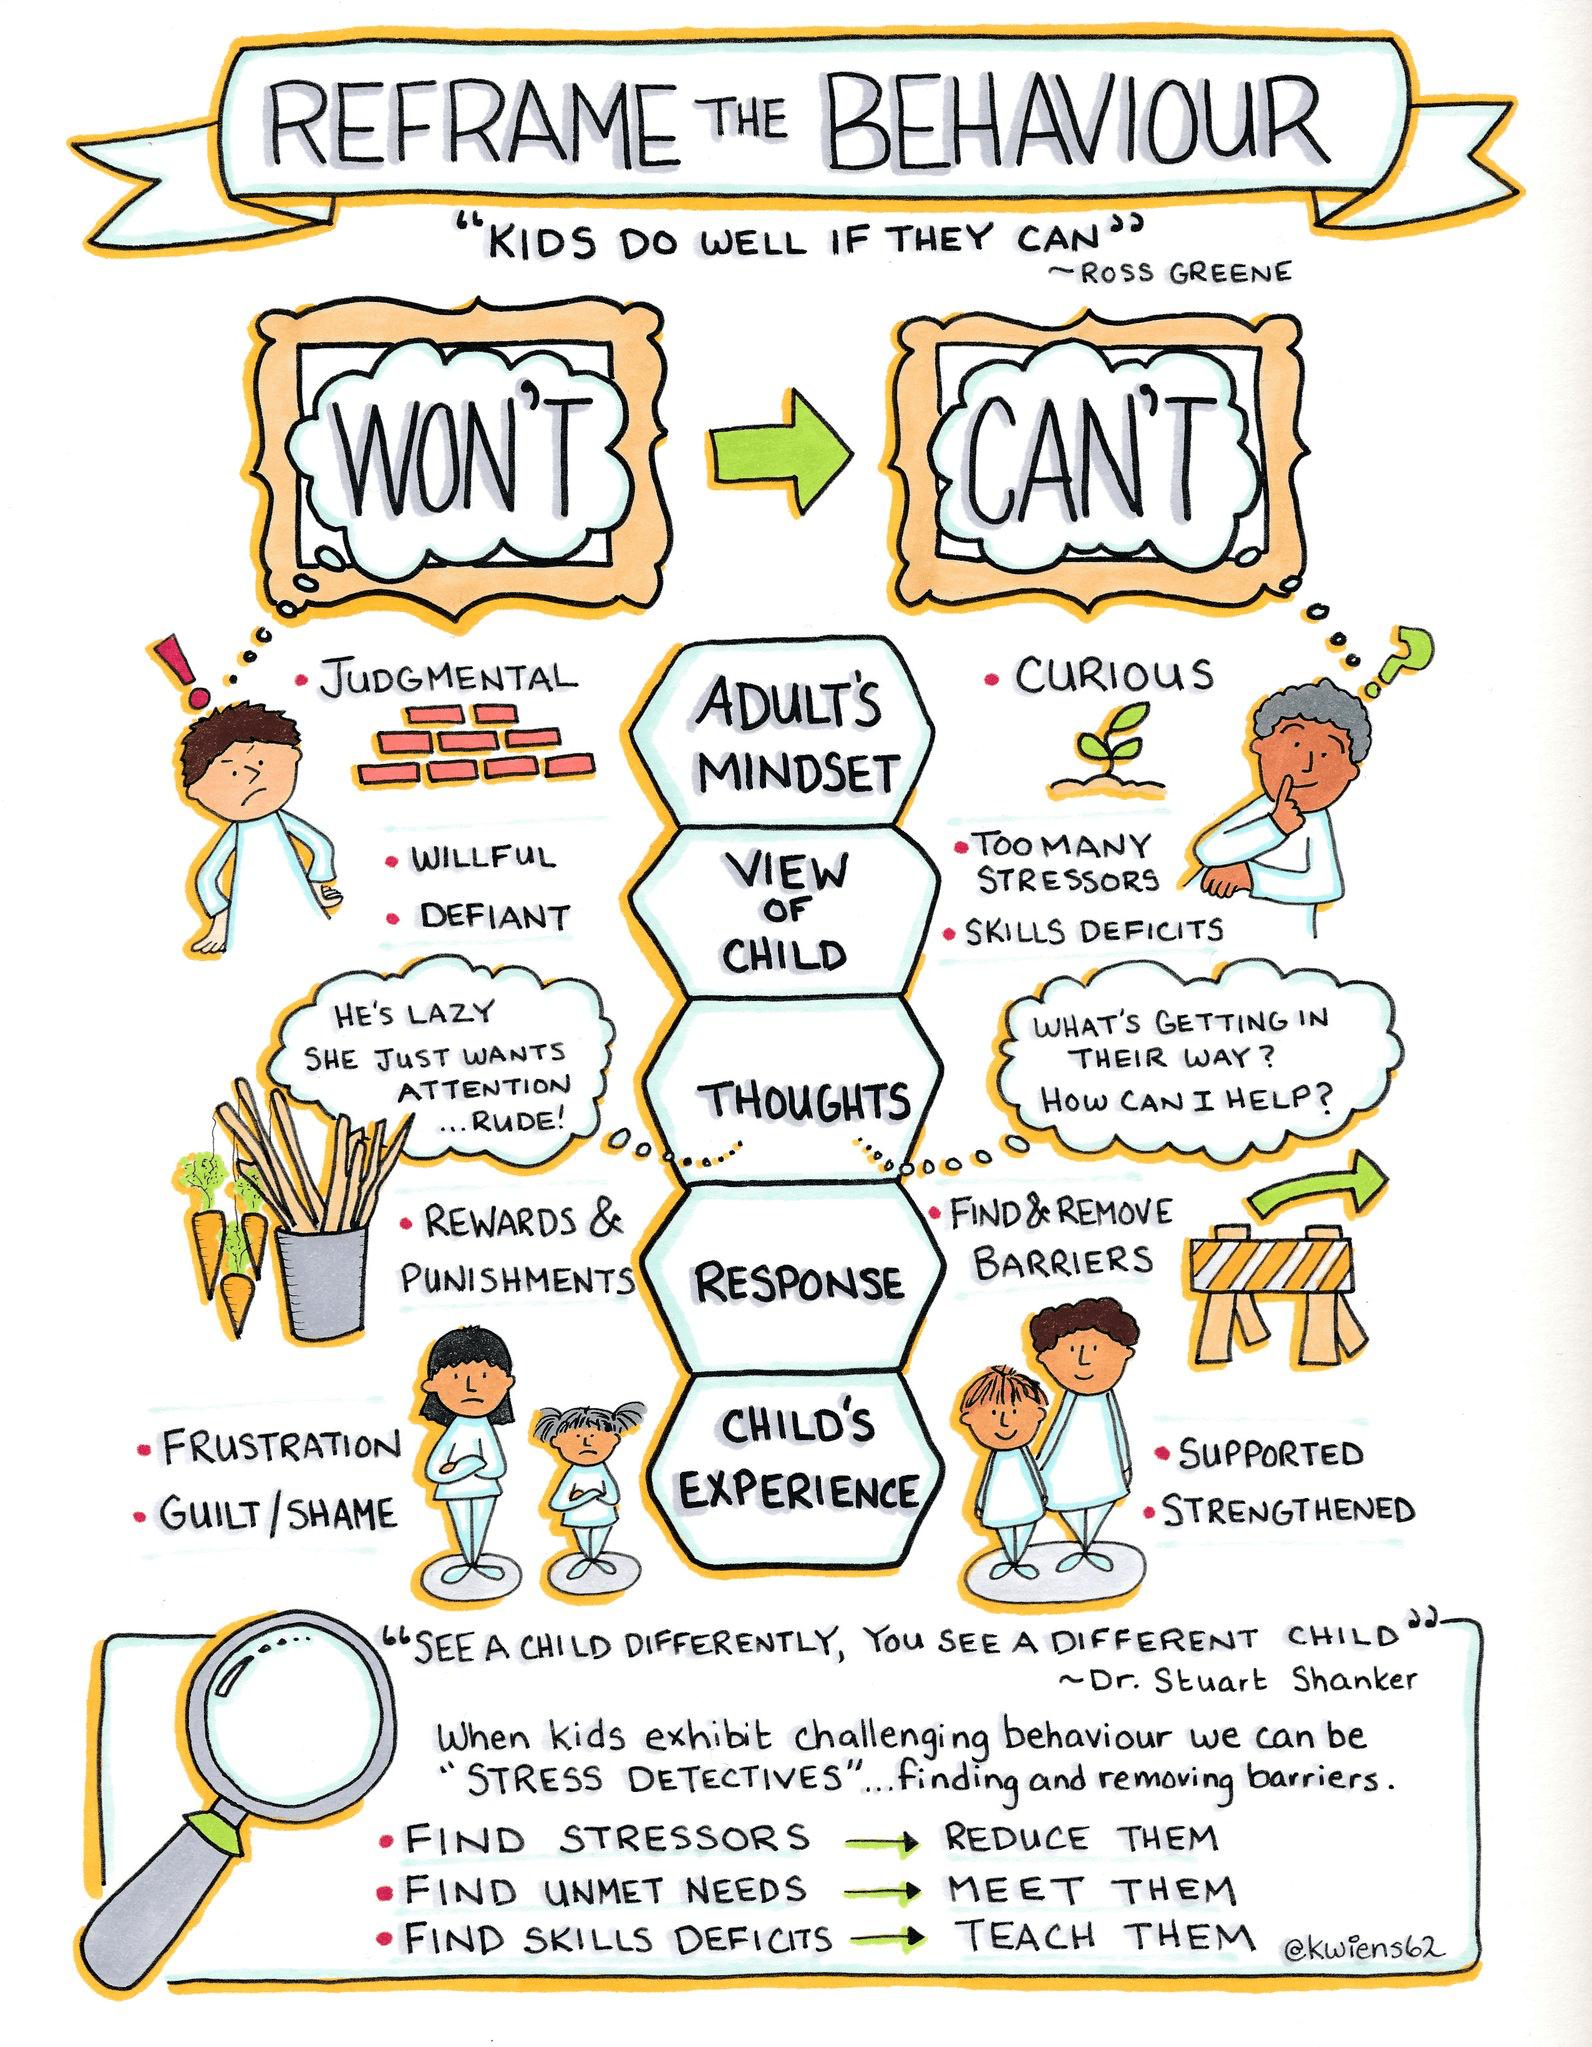 Sketchnote & reframing children's behavior Sketchnotes